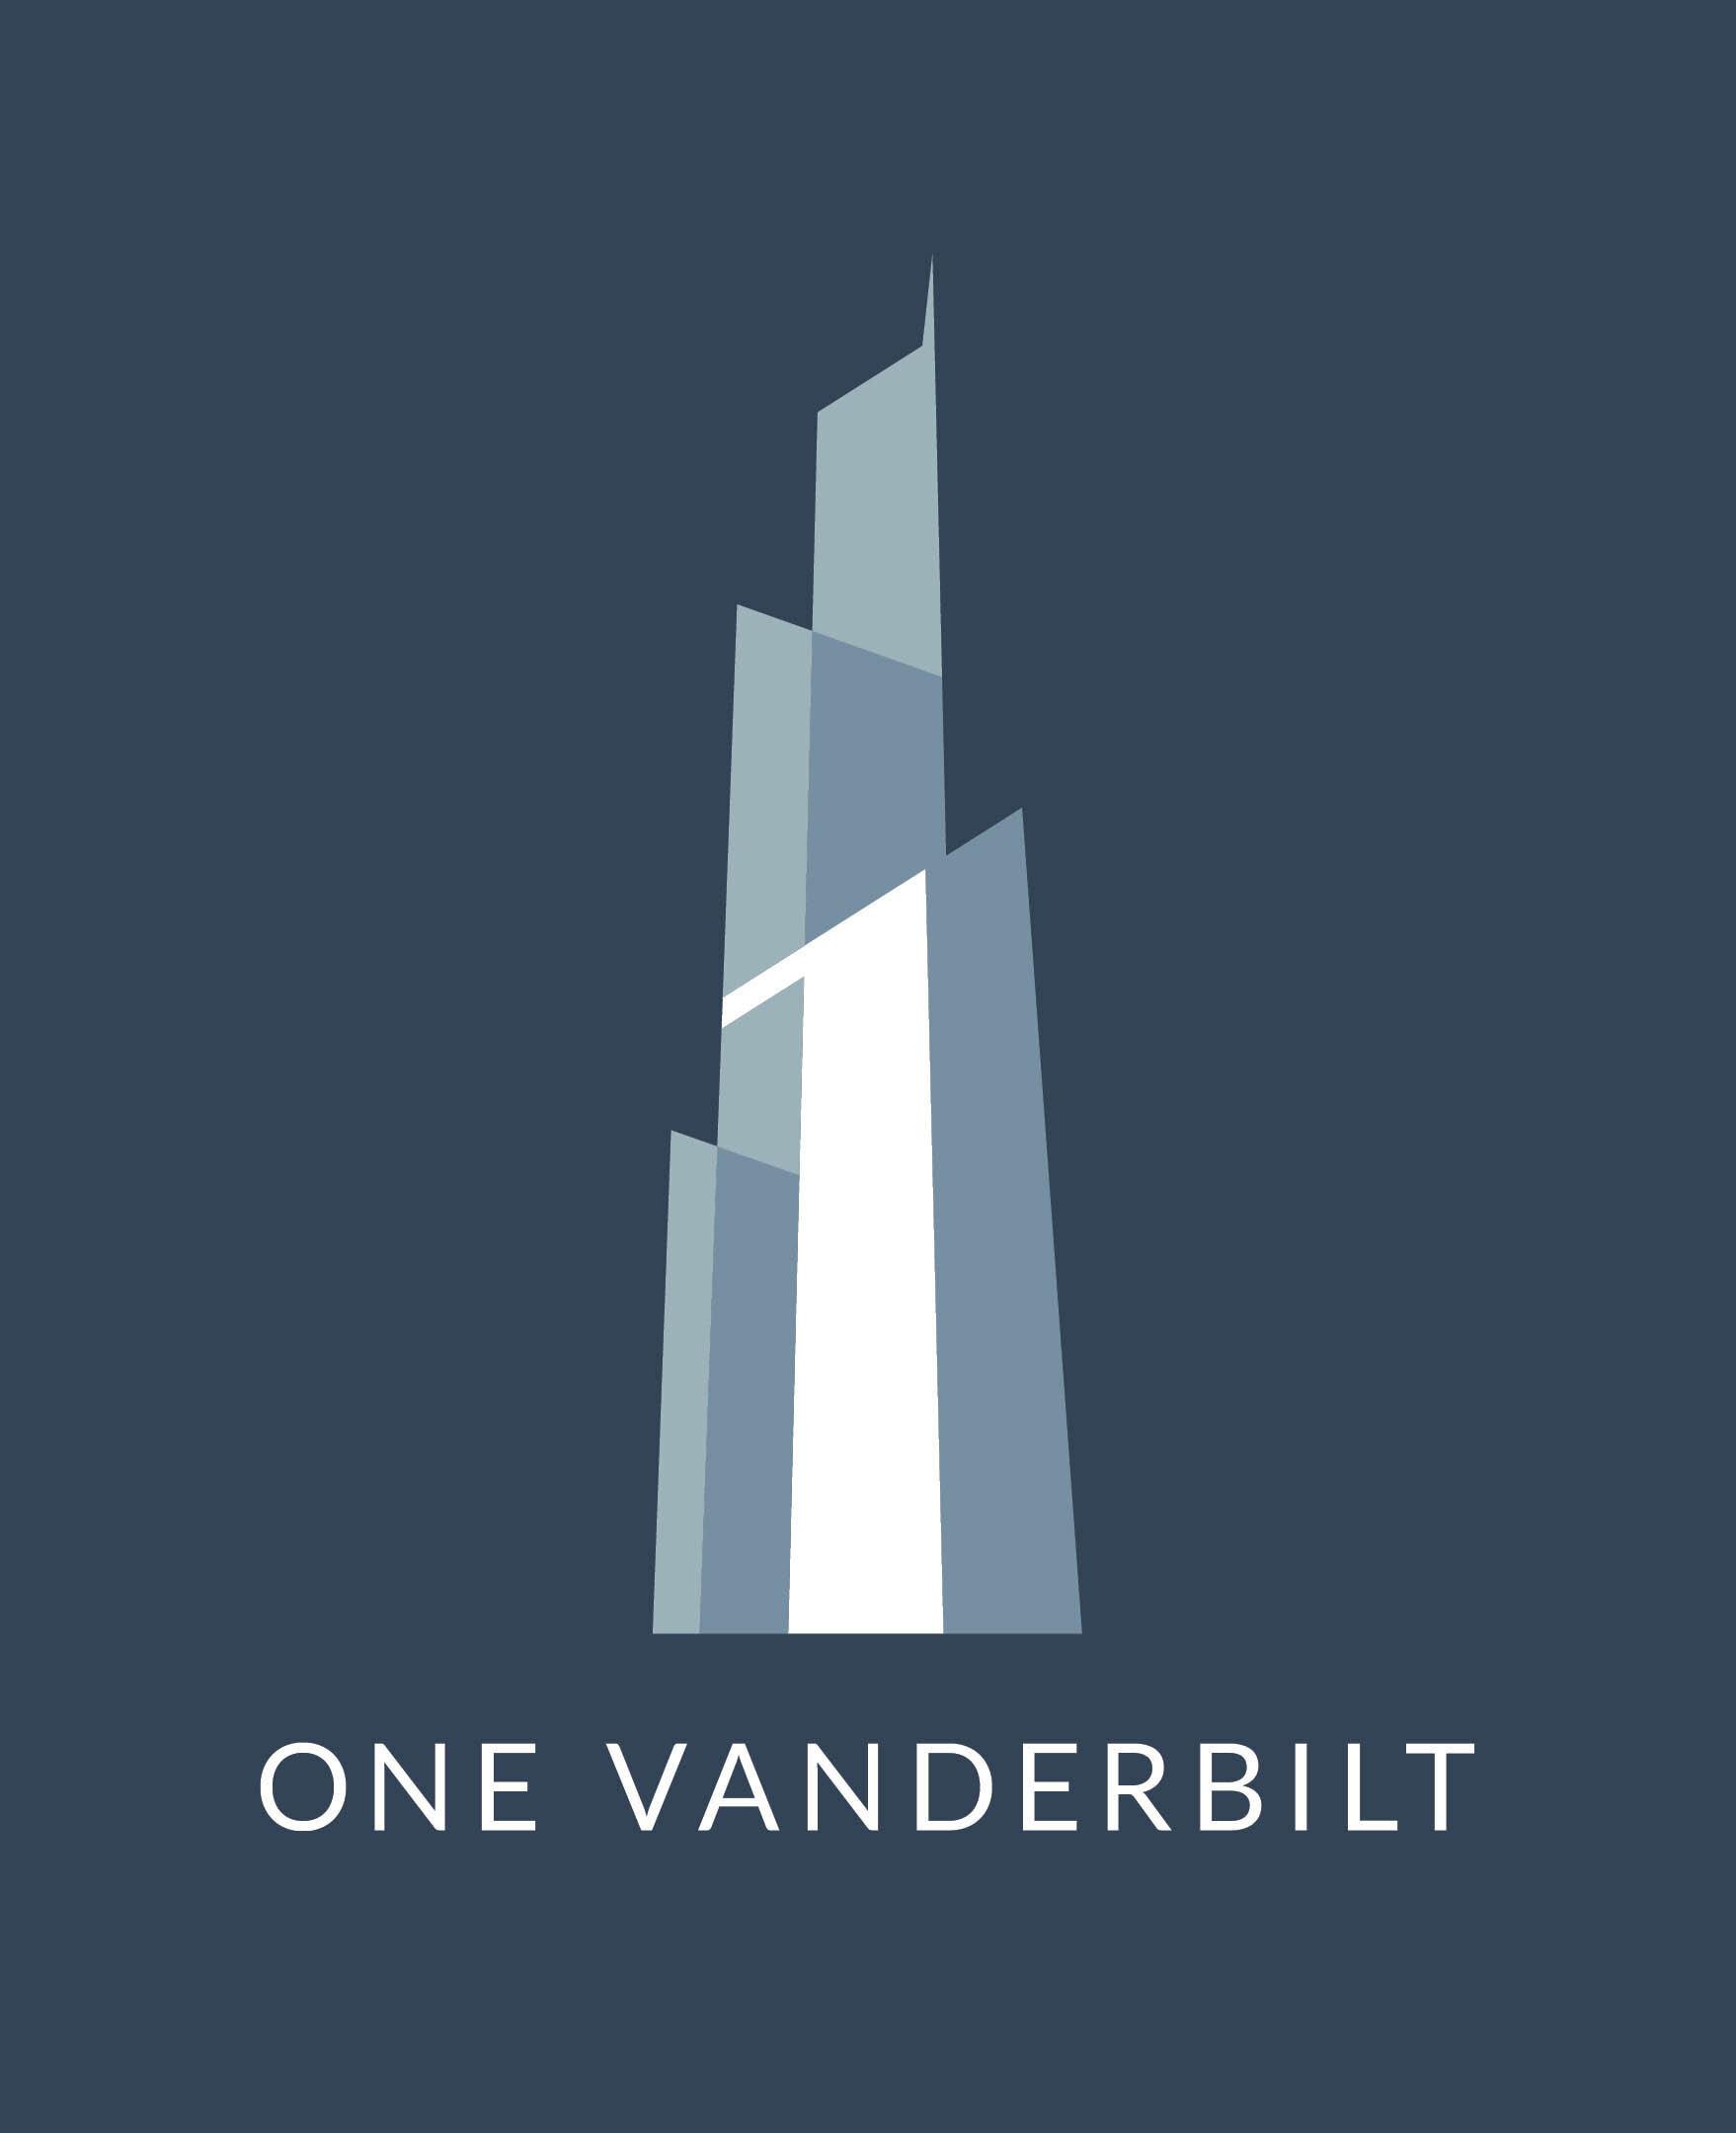 one-vanderbilt-logo-1.jpg